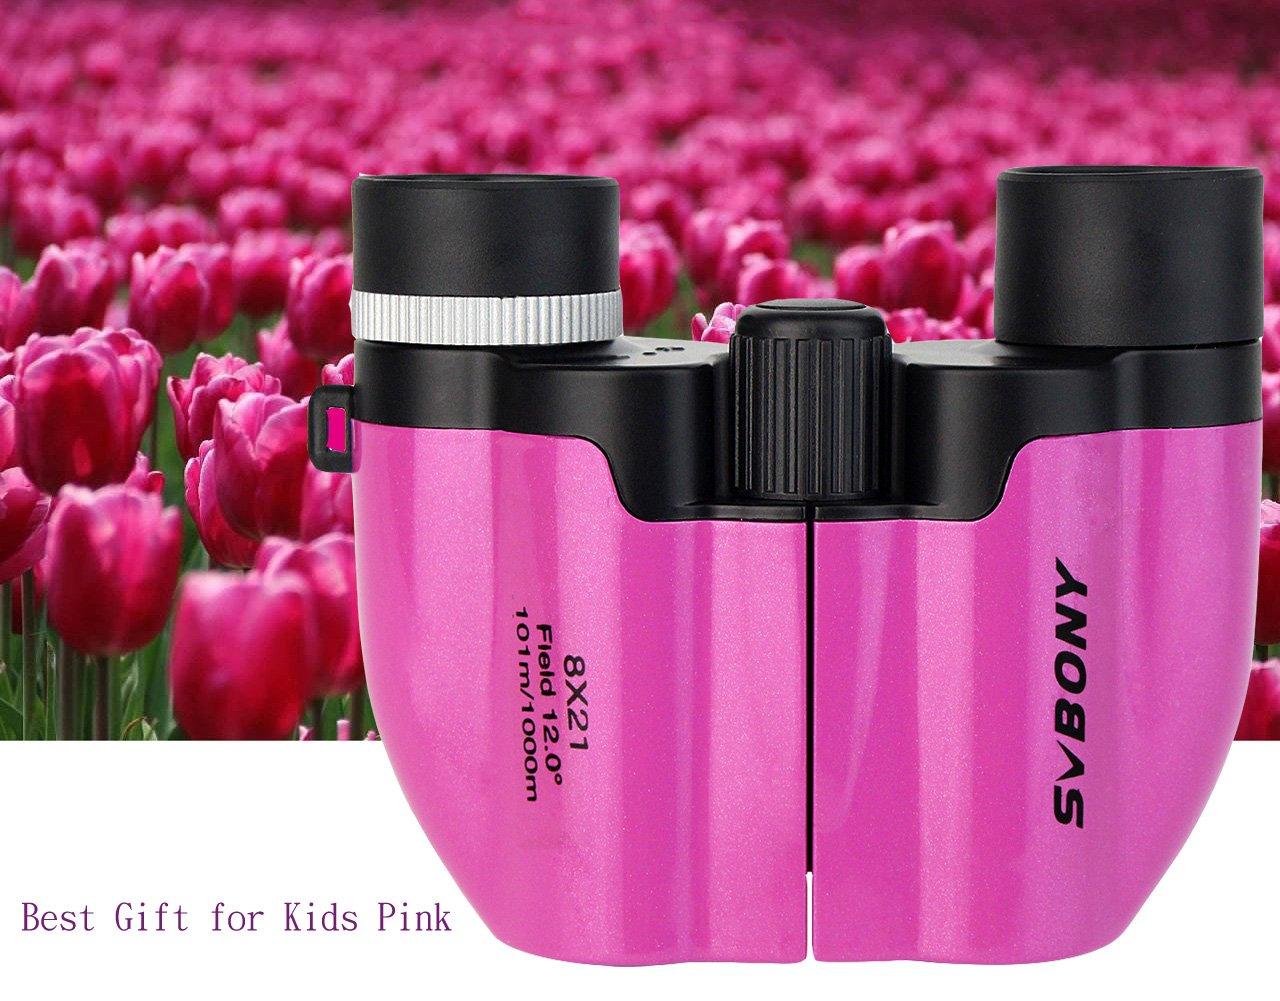 Svbony sv fernglas für kinder ultra kompakt mini binocular